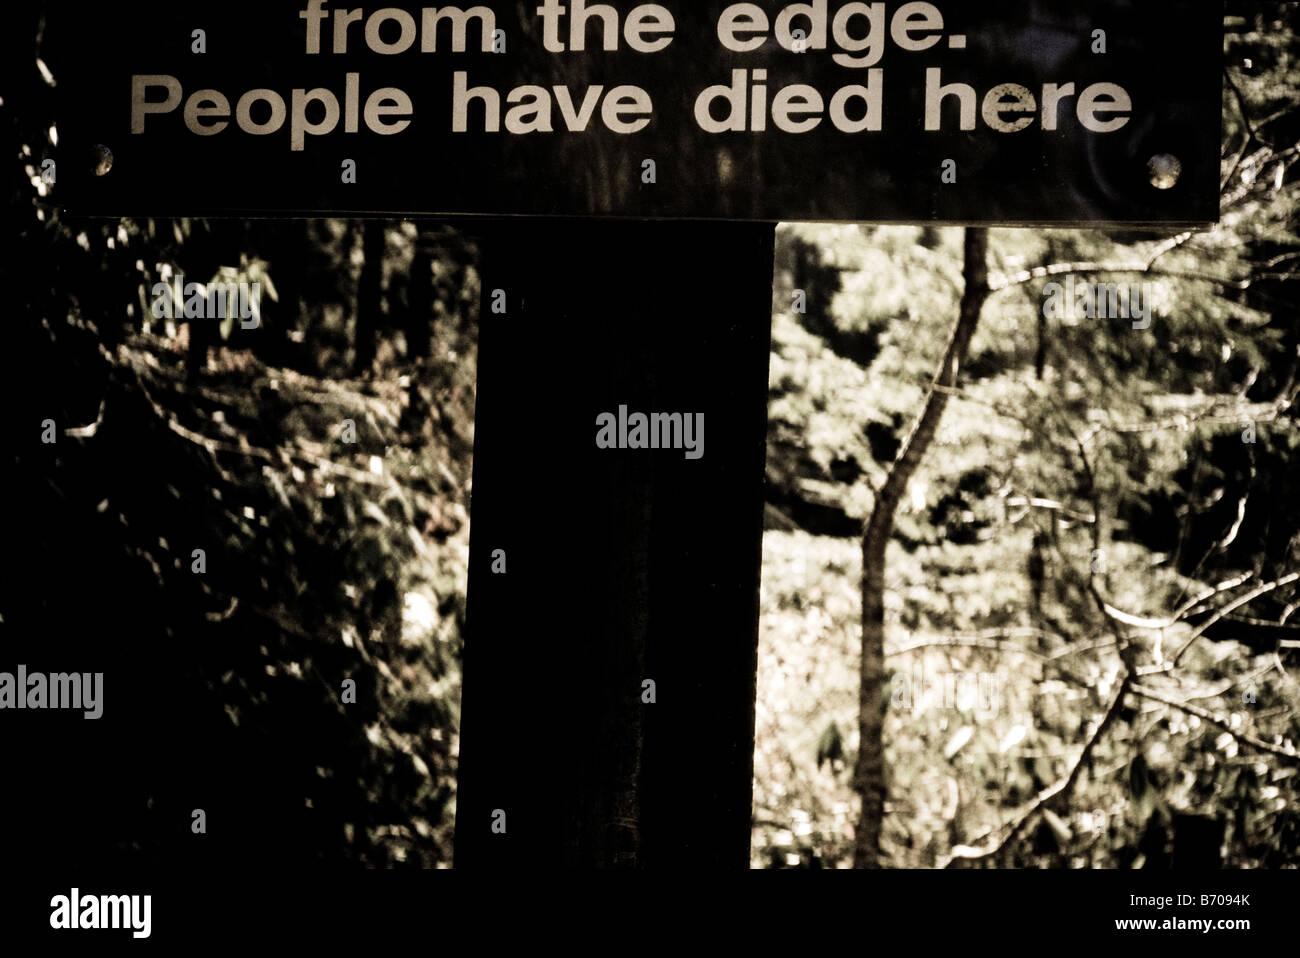 Warning sign, Pisgah National Forest, North Carolina. - Stock Image